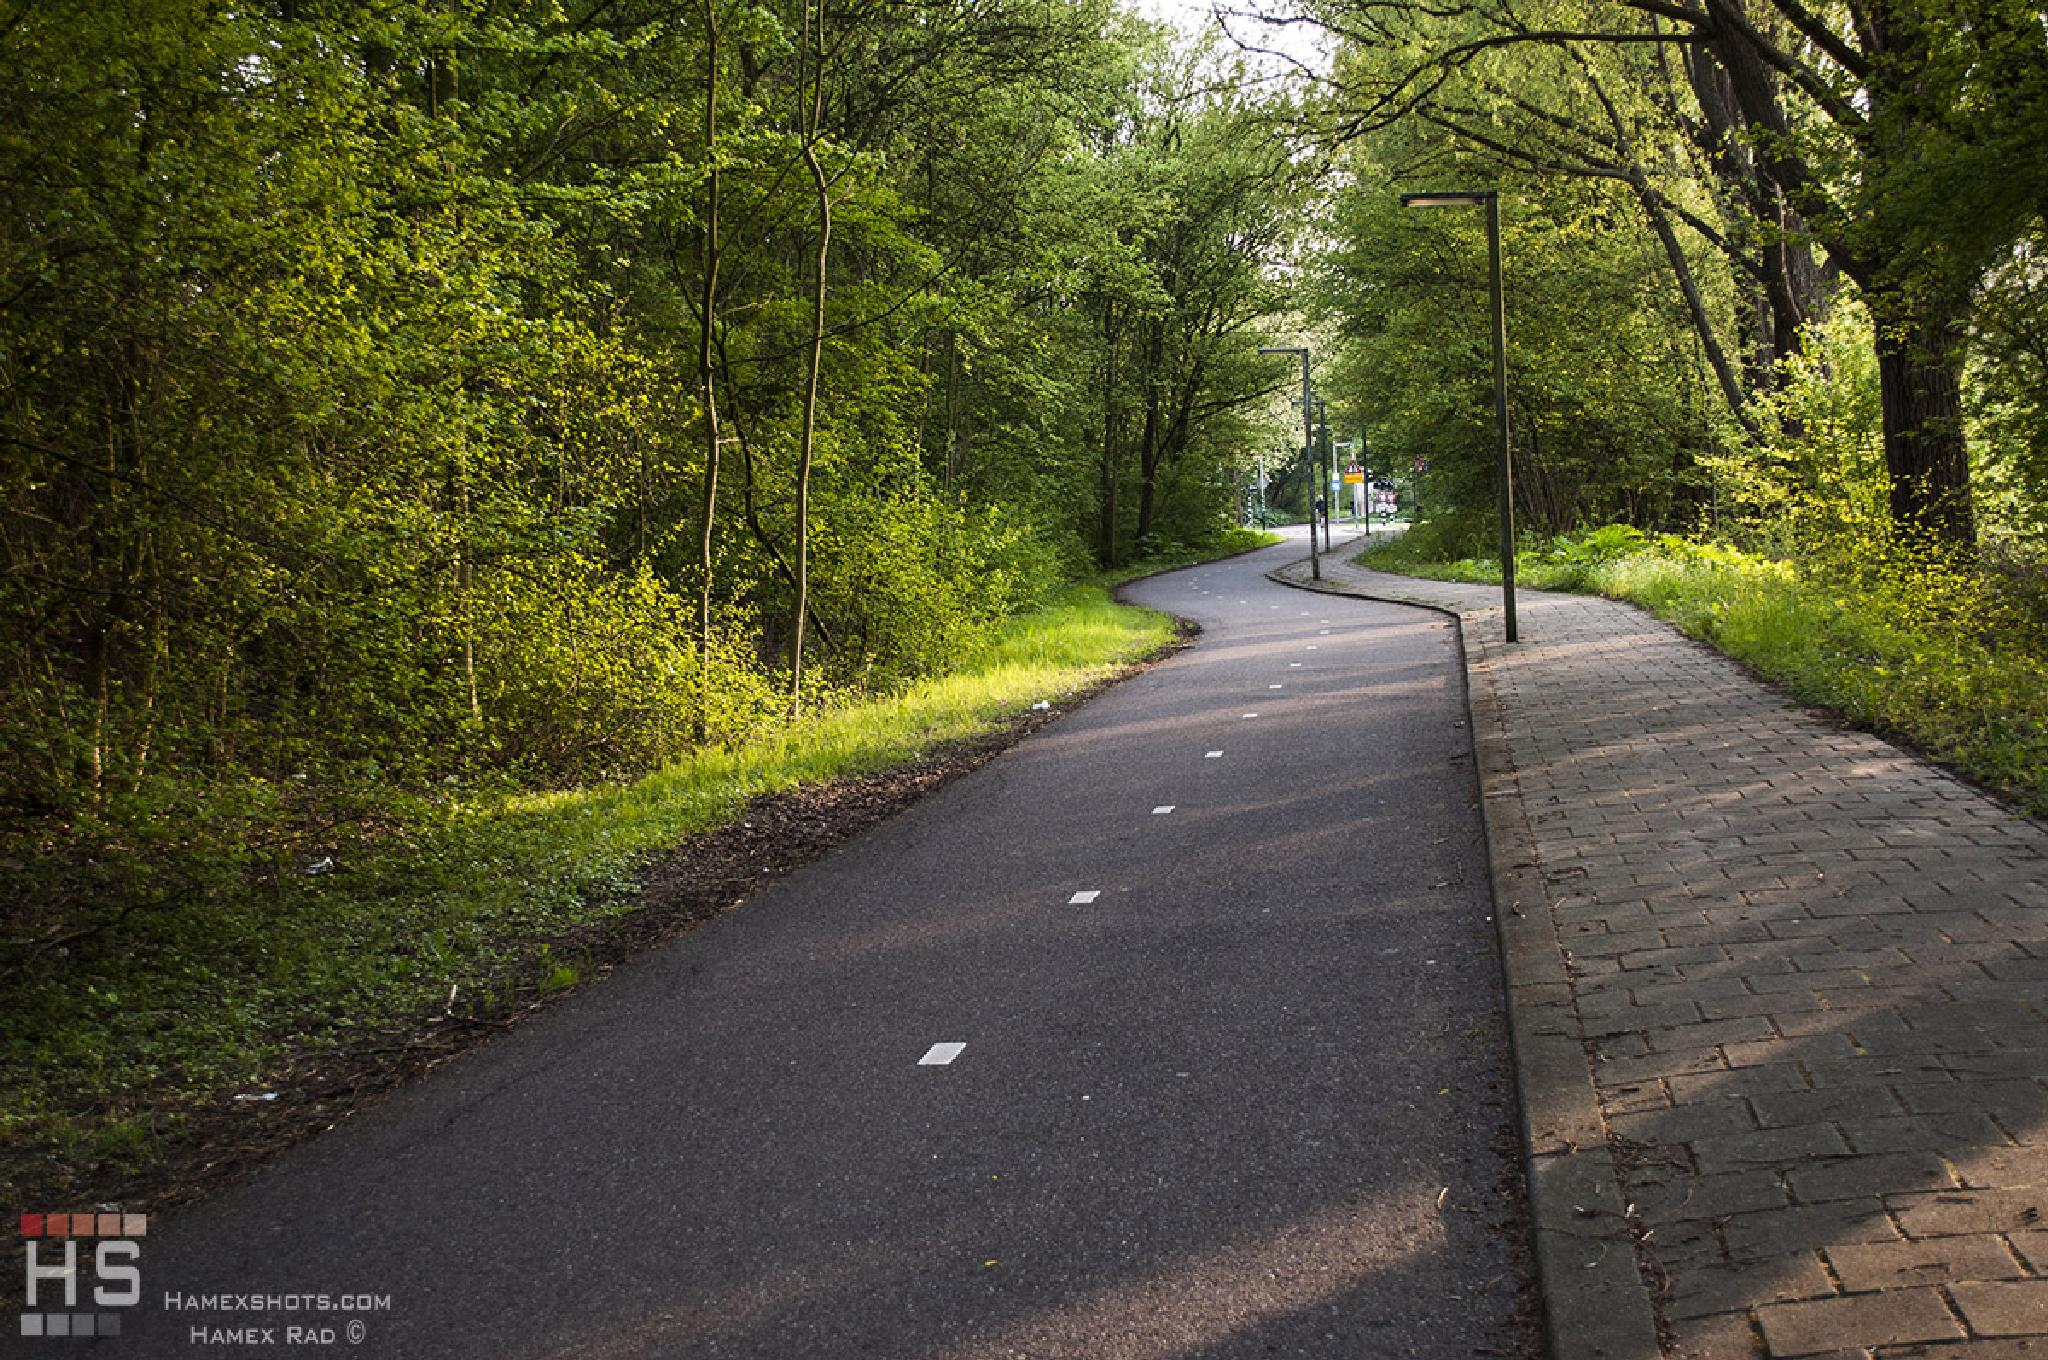 Delft bike road by Hamex Rad